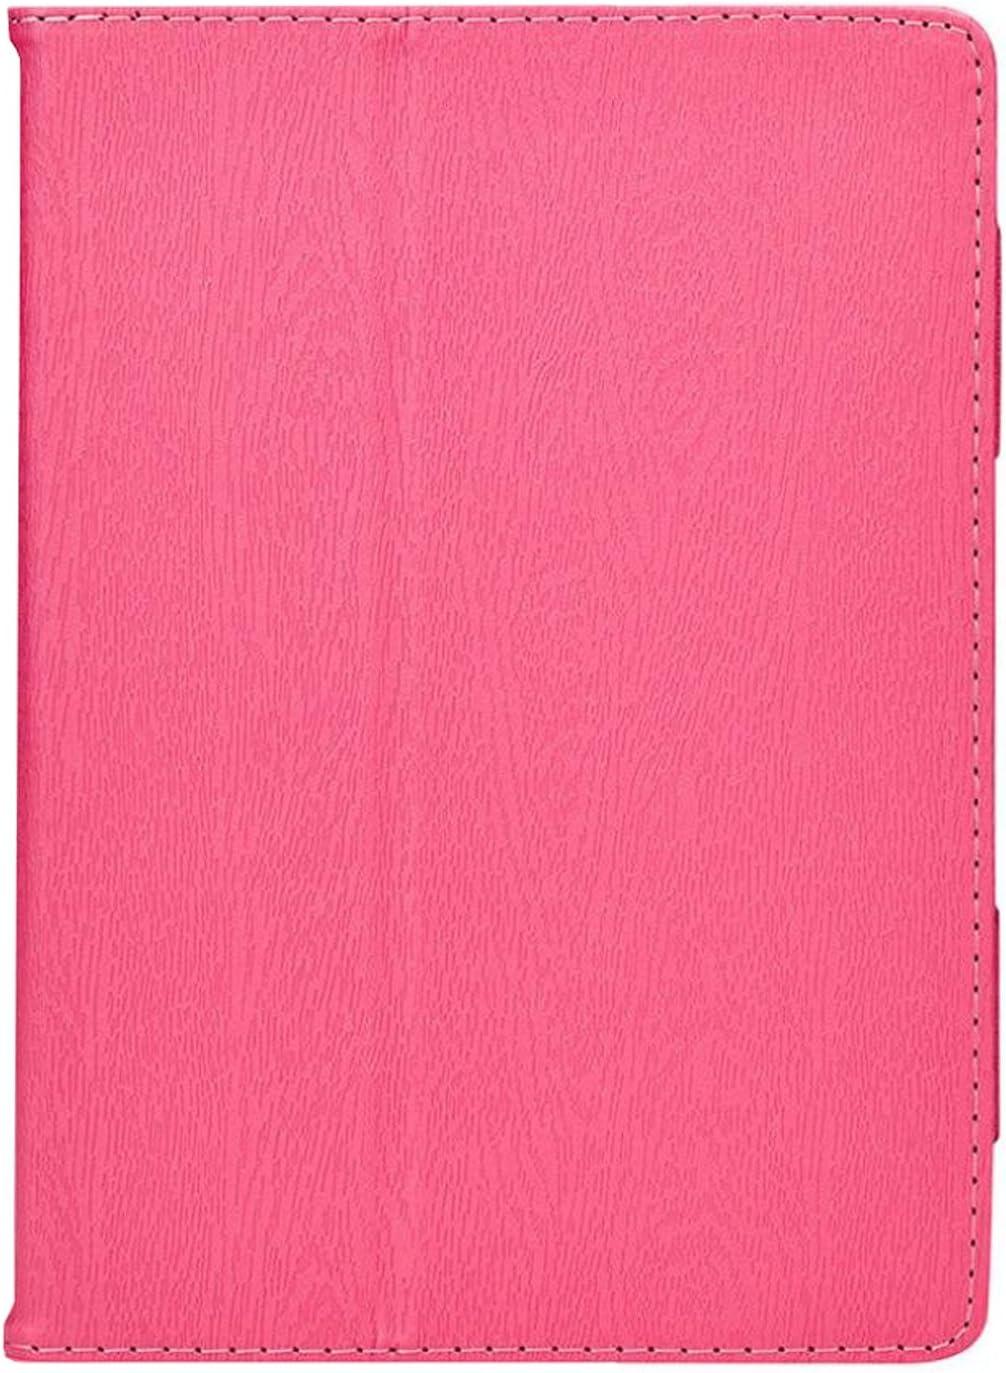 Transwon 10 Inch Tablet Case Compatible with VANKYO MatrixPad S30, ZONKO 10.1, Winsing 10, Hoozo 10, Lectrus 10.1, Victbing 10, FLYINGTECH 10, WECOOL 10, DUODUOGO K6, SUMTAB 10, CHENEN 10 - Pink